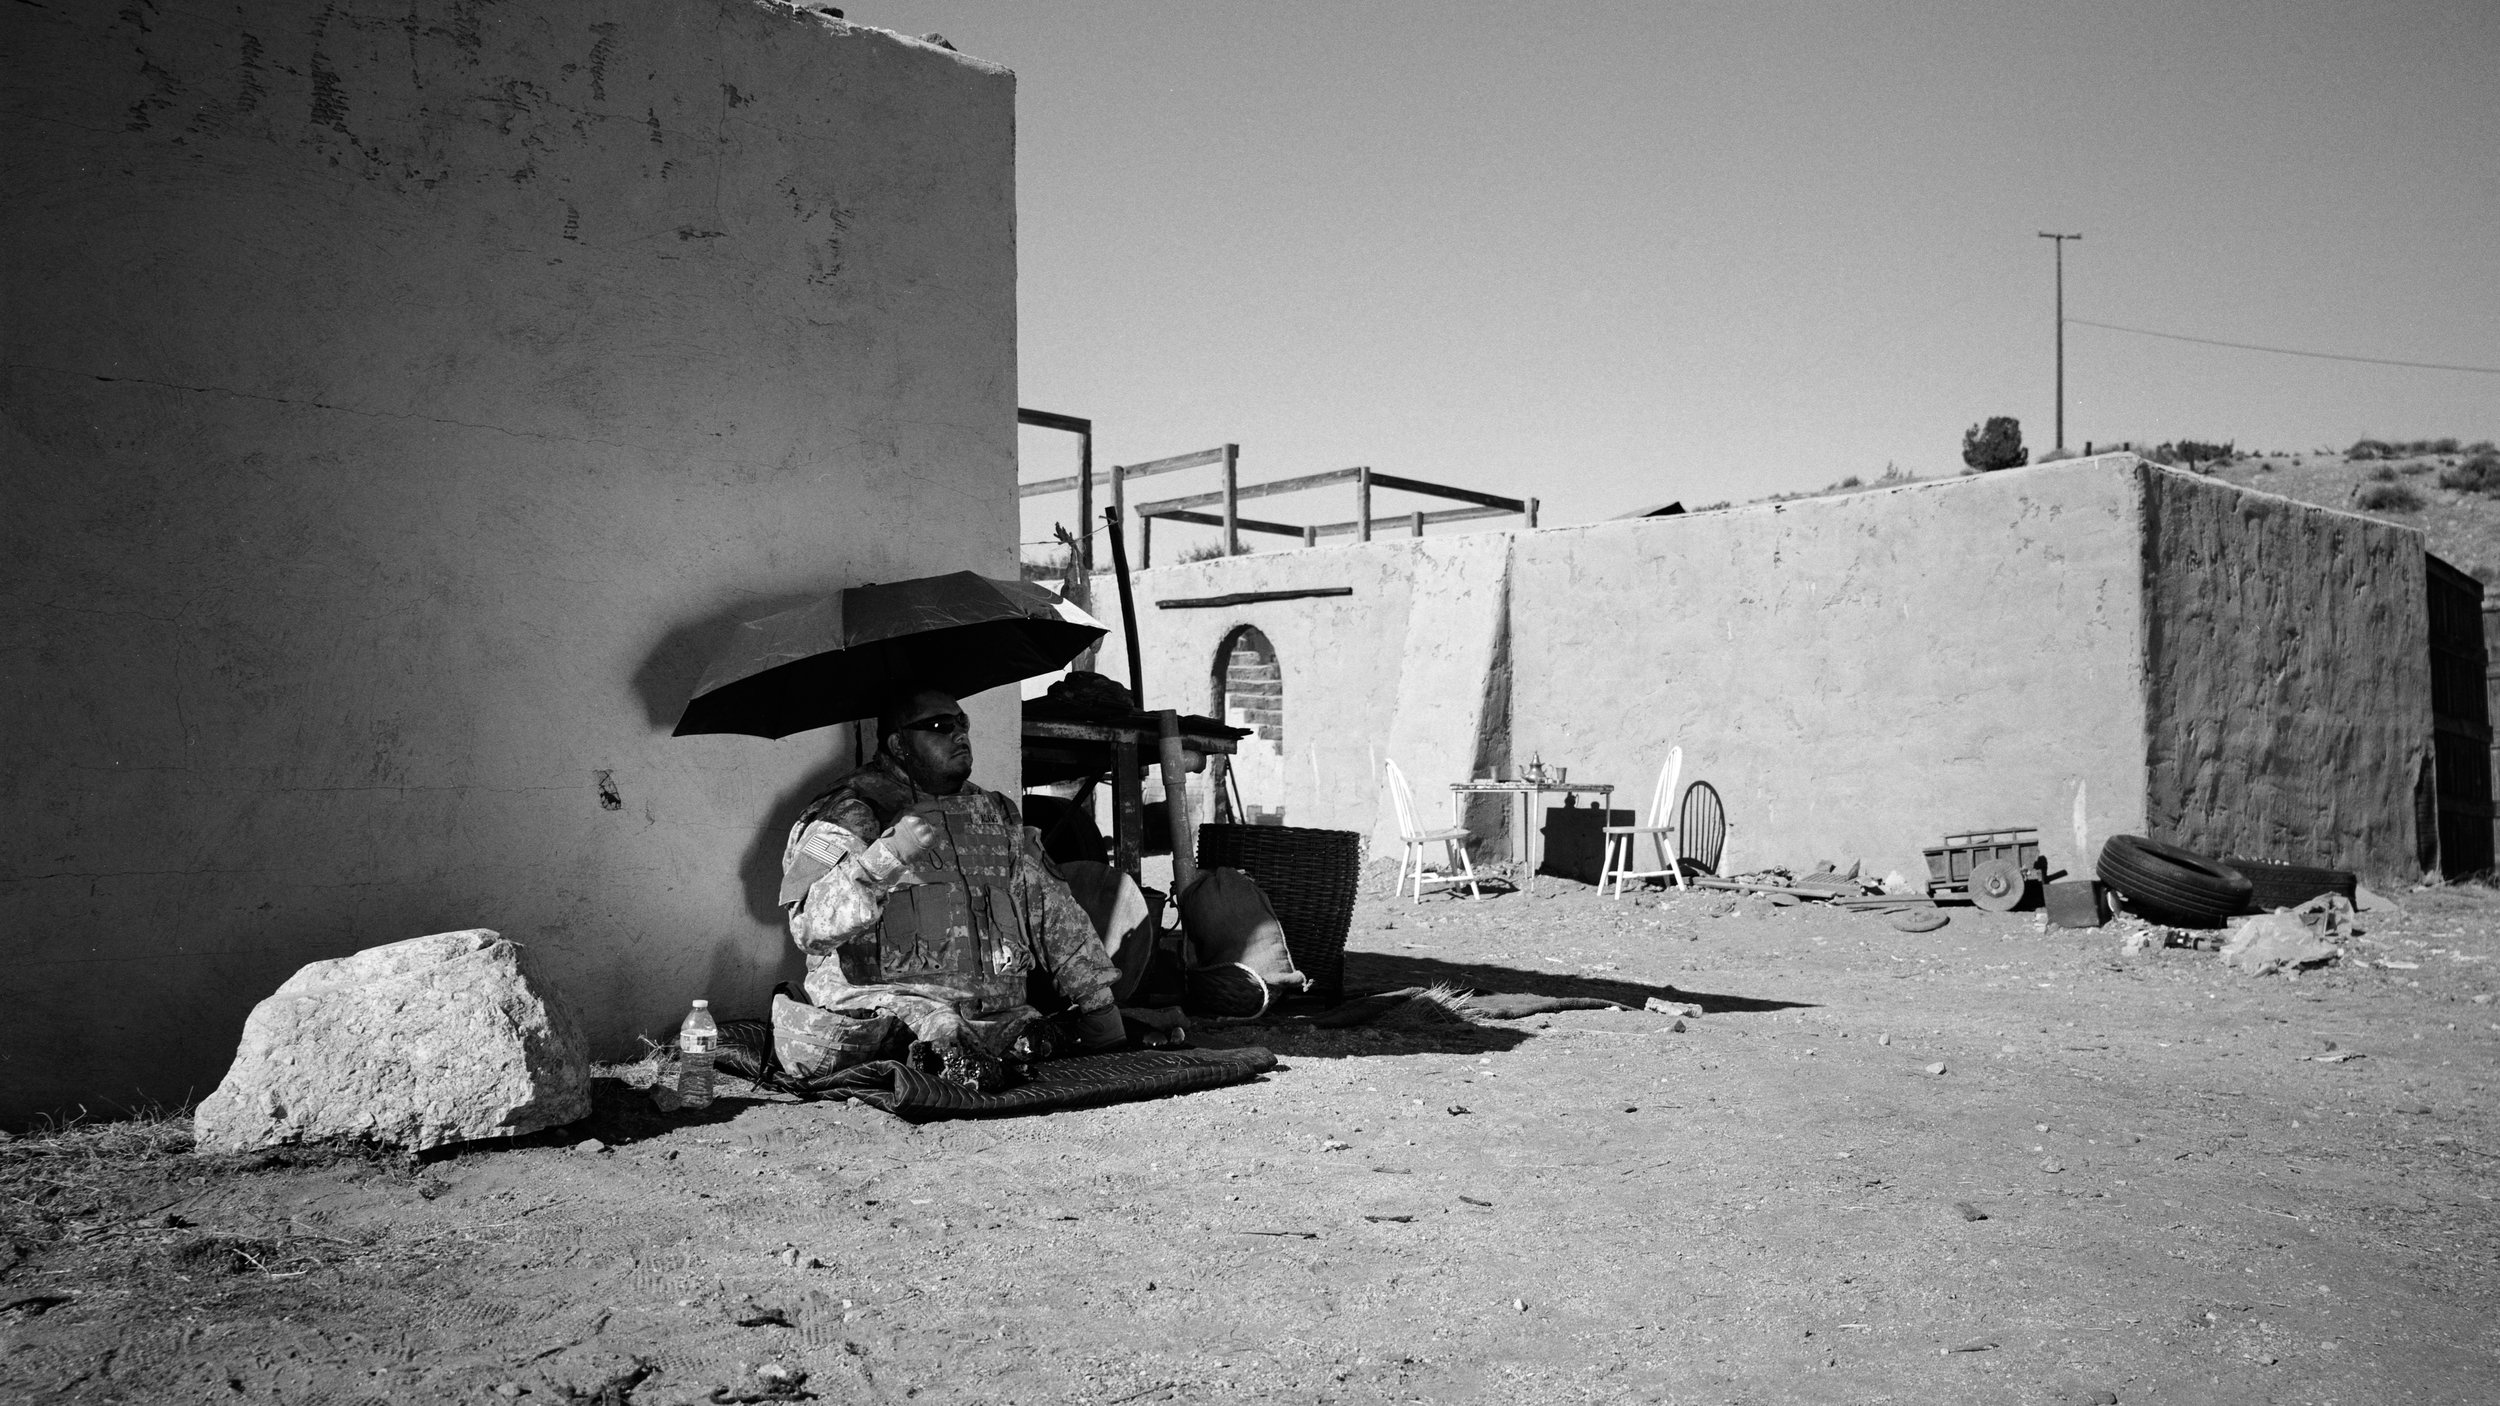 Fort Irwin_67.jpg